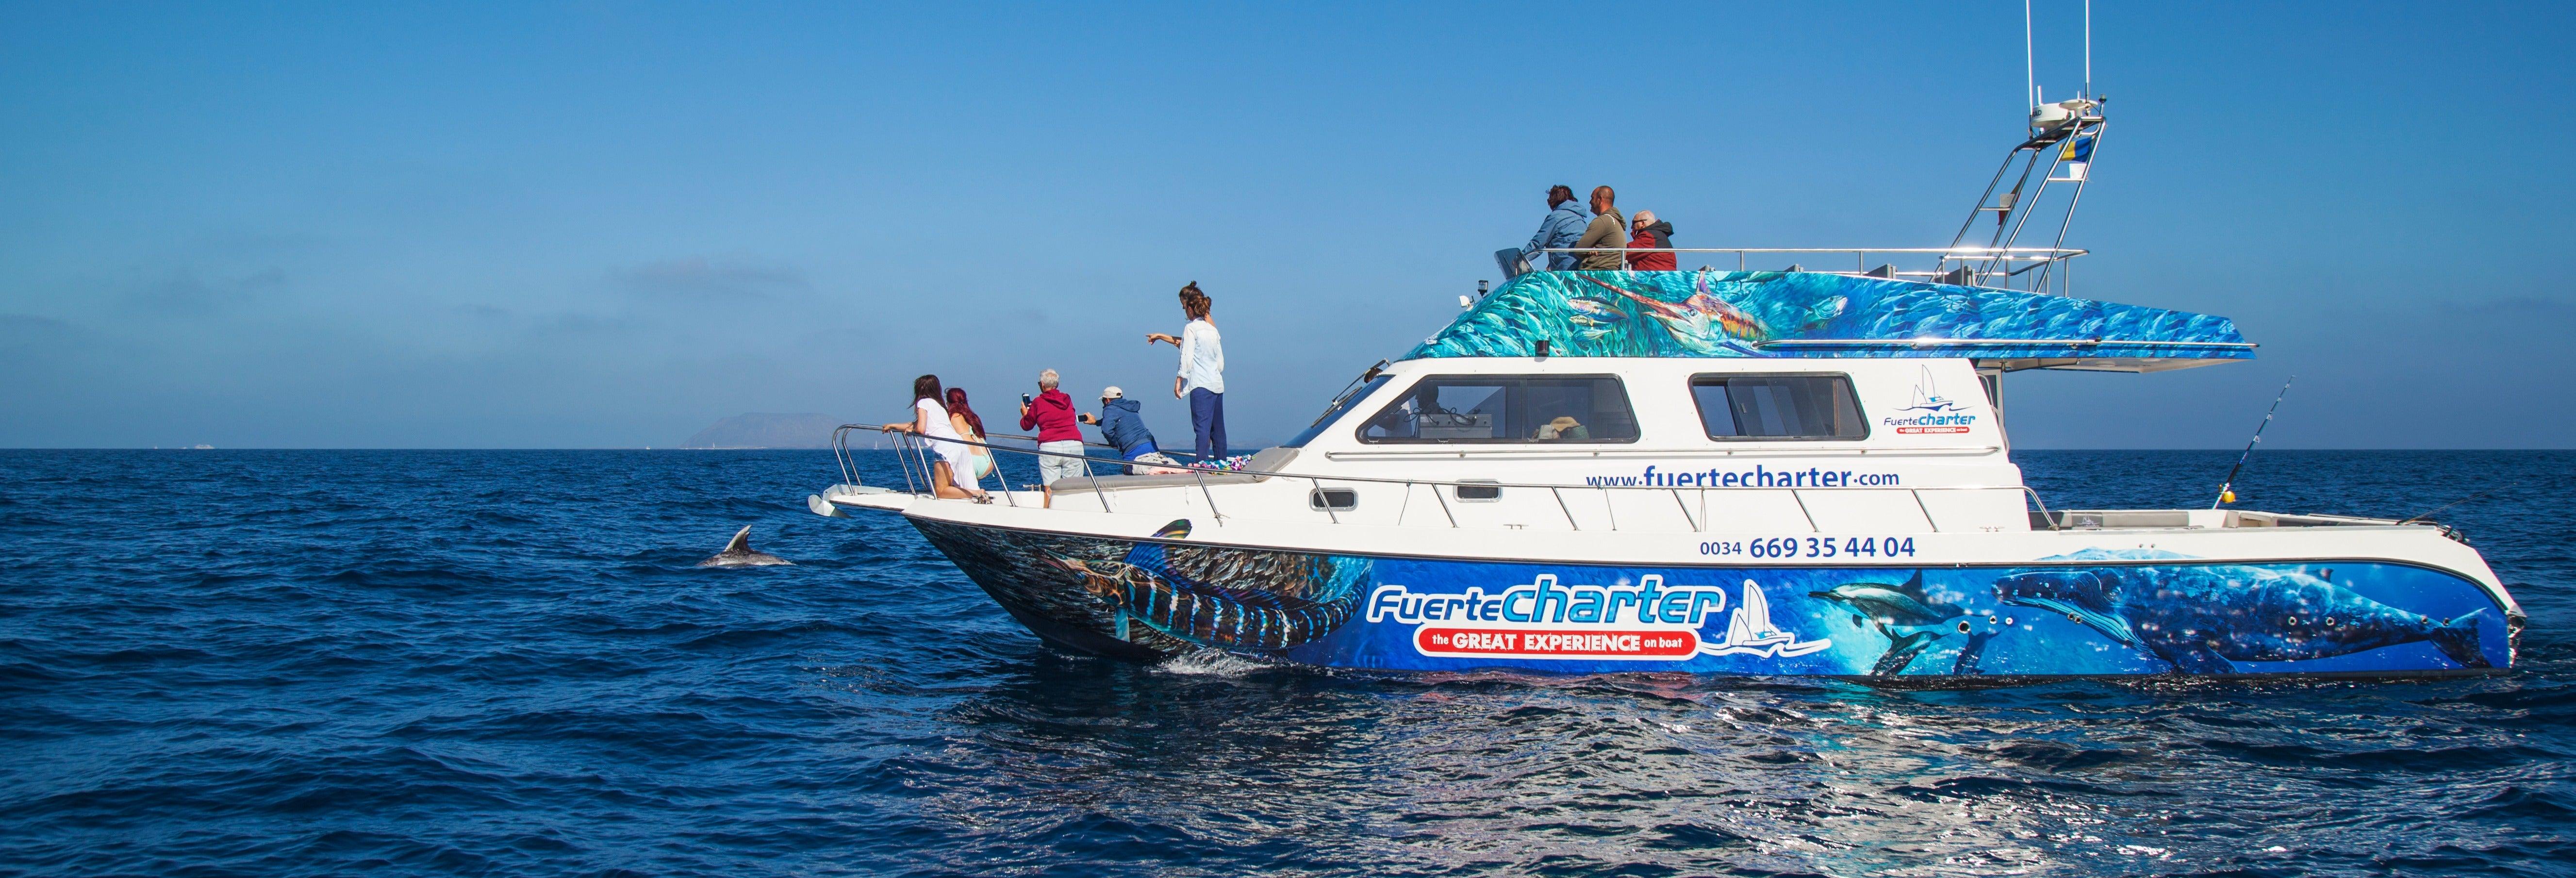 Whale Watching Catamaran Tour